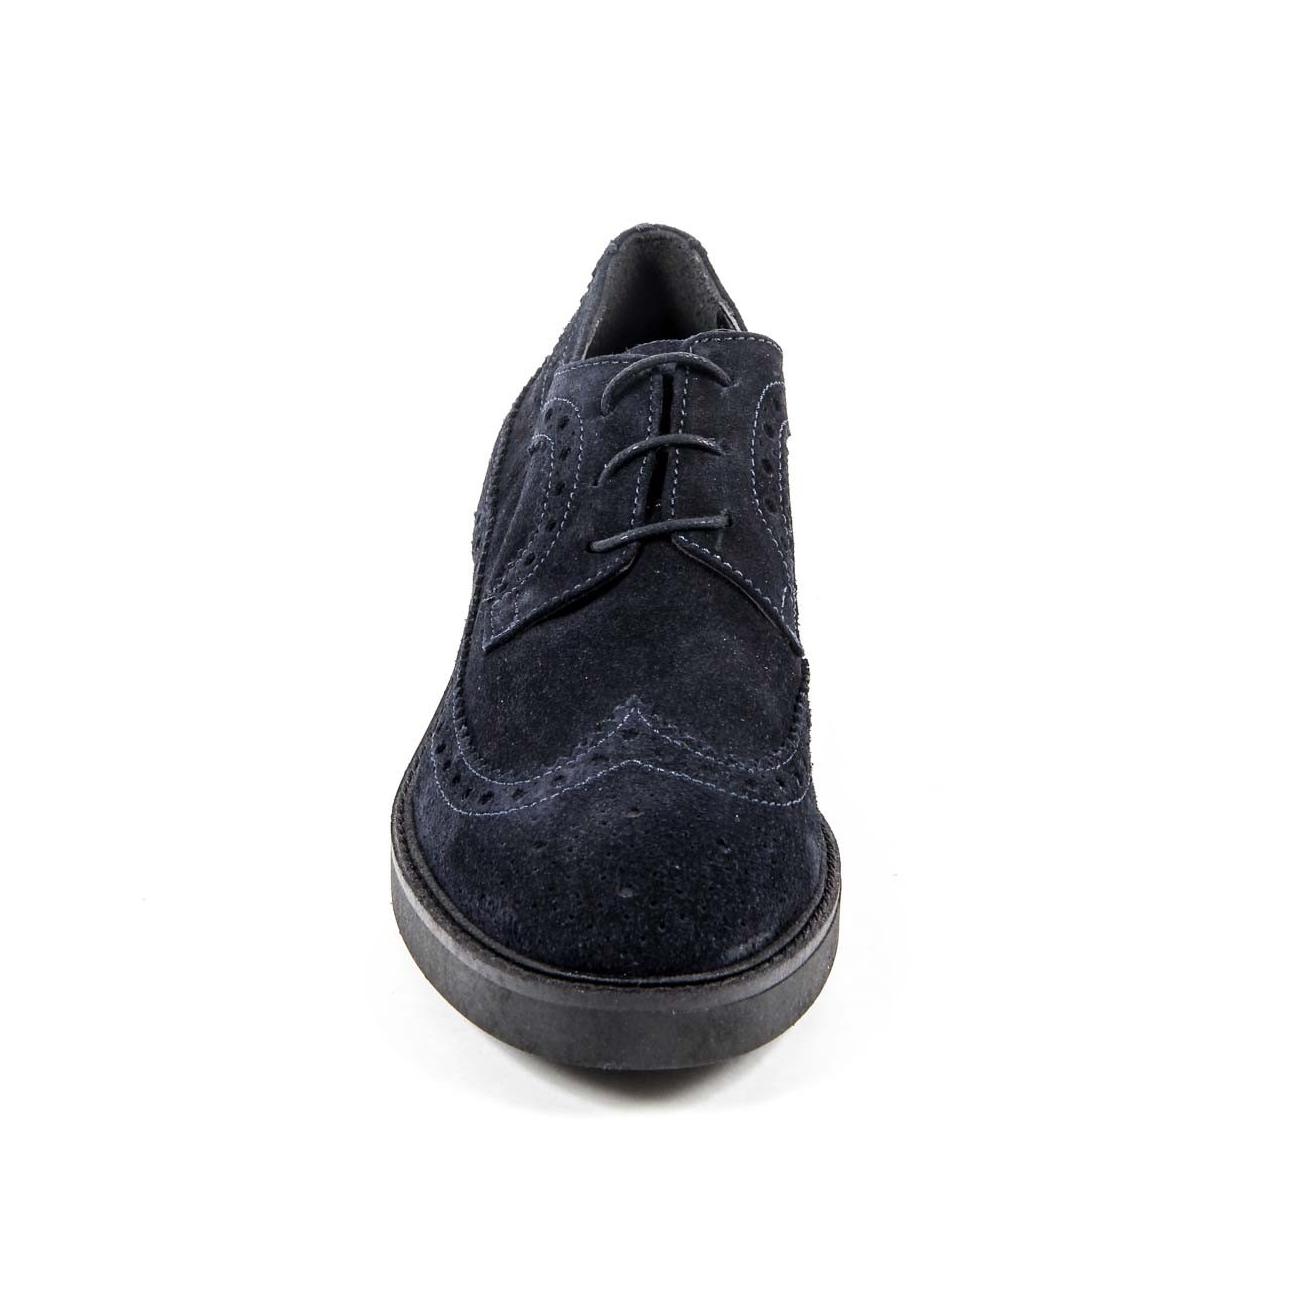 V 1969 Italia Women's Brogue Shoe B1670 VELOUR BLUE